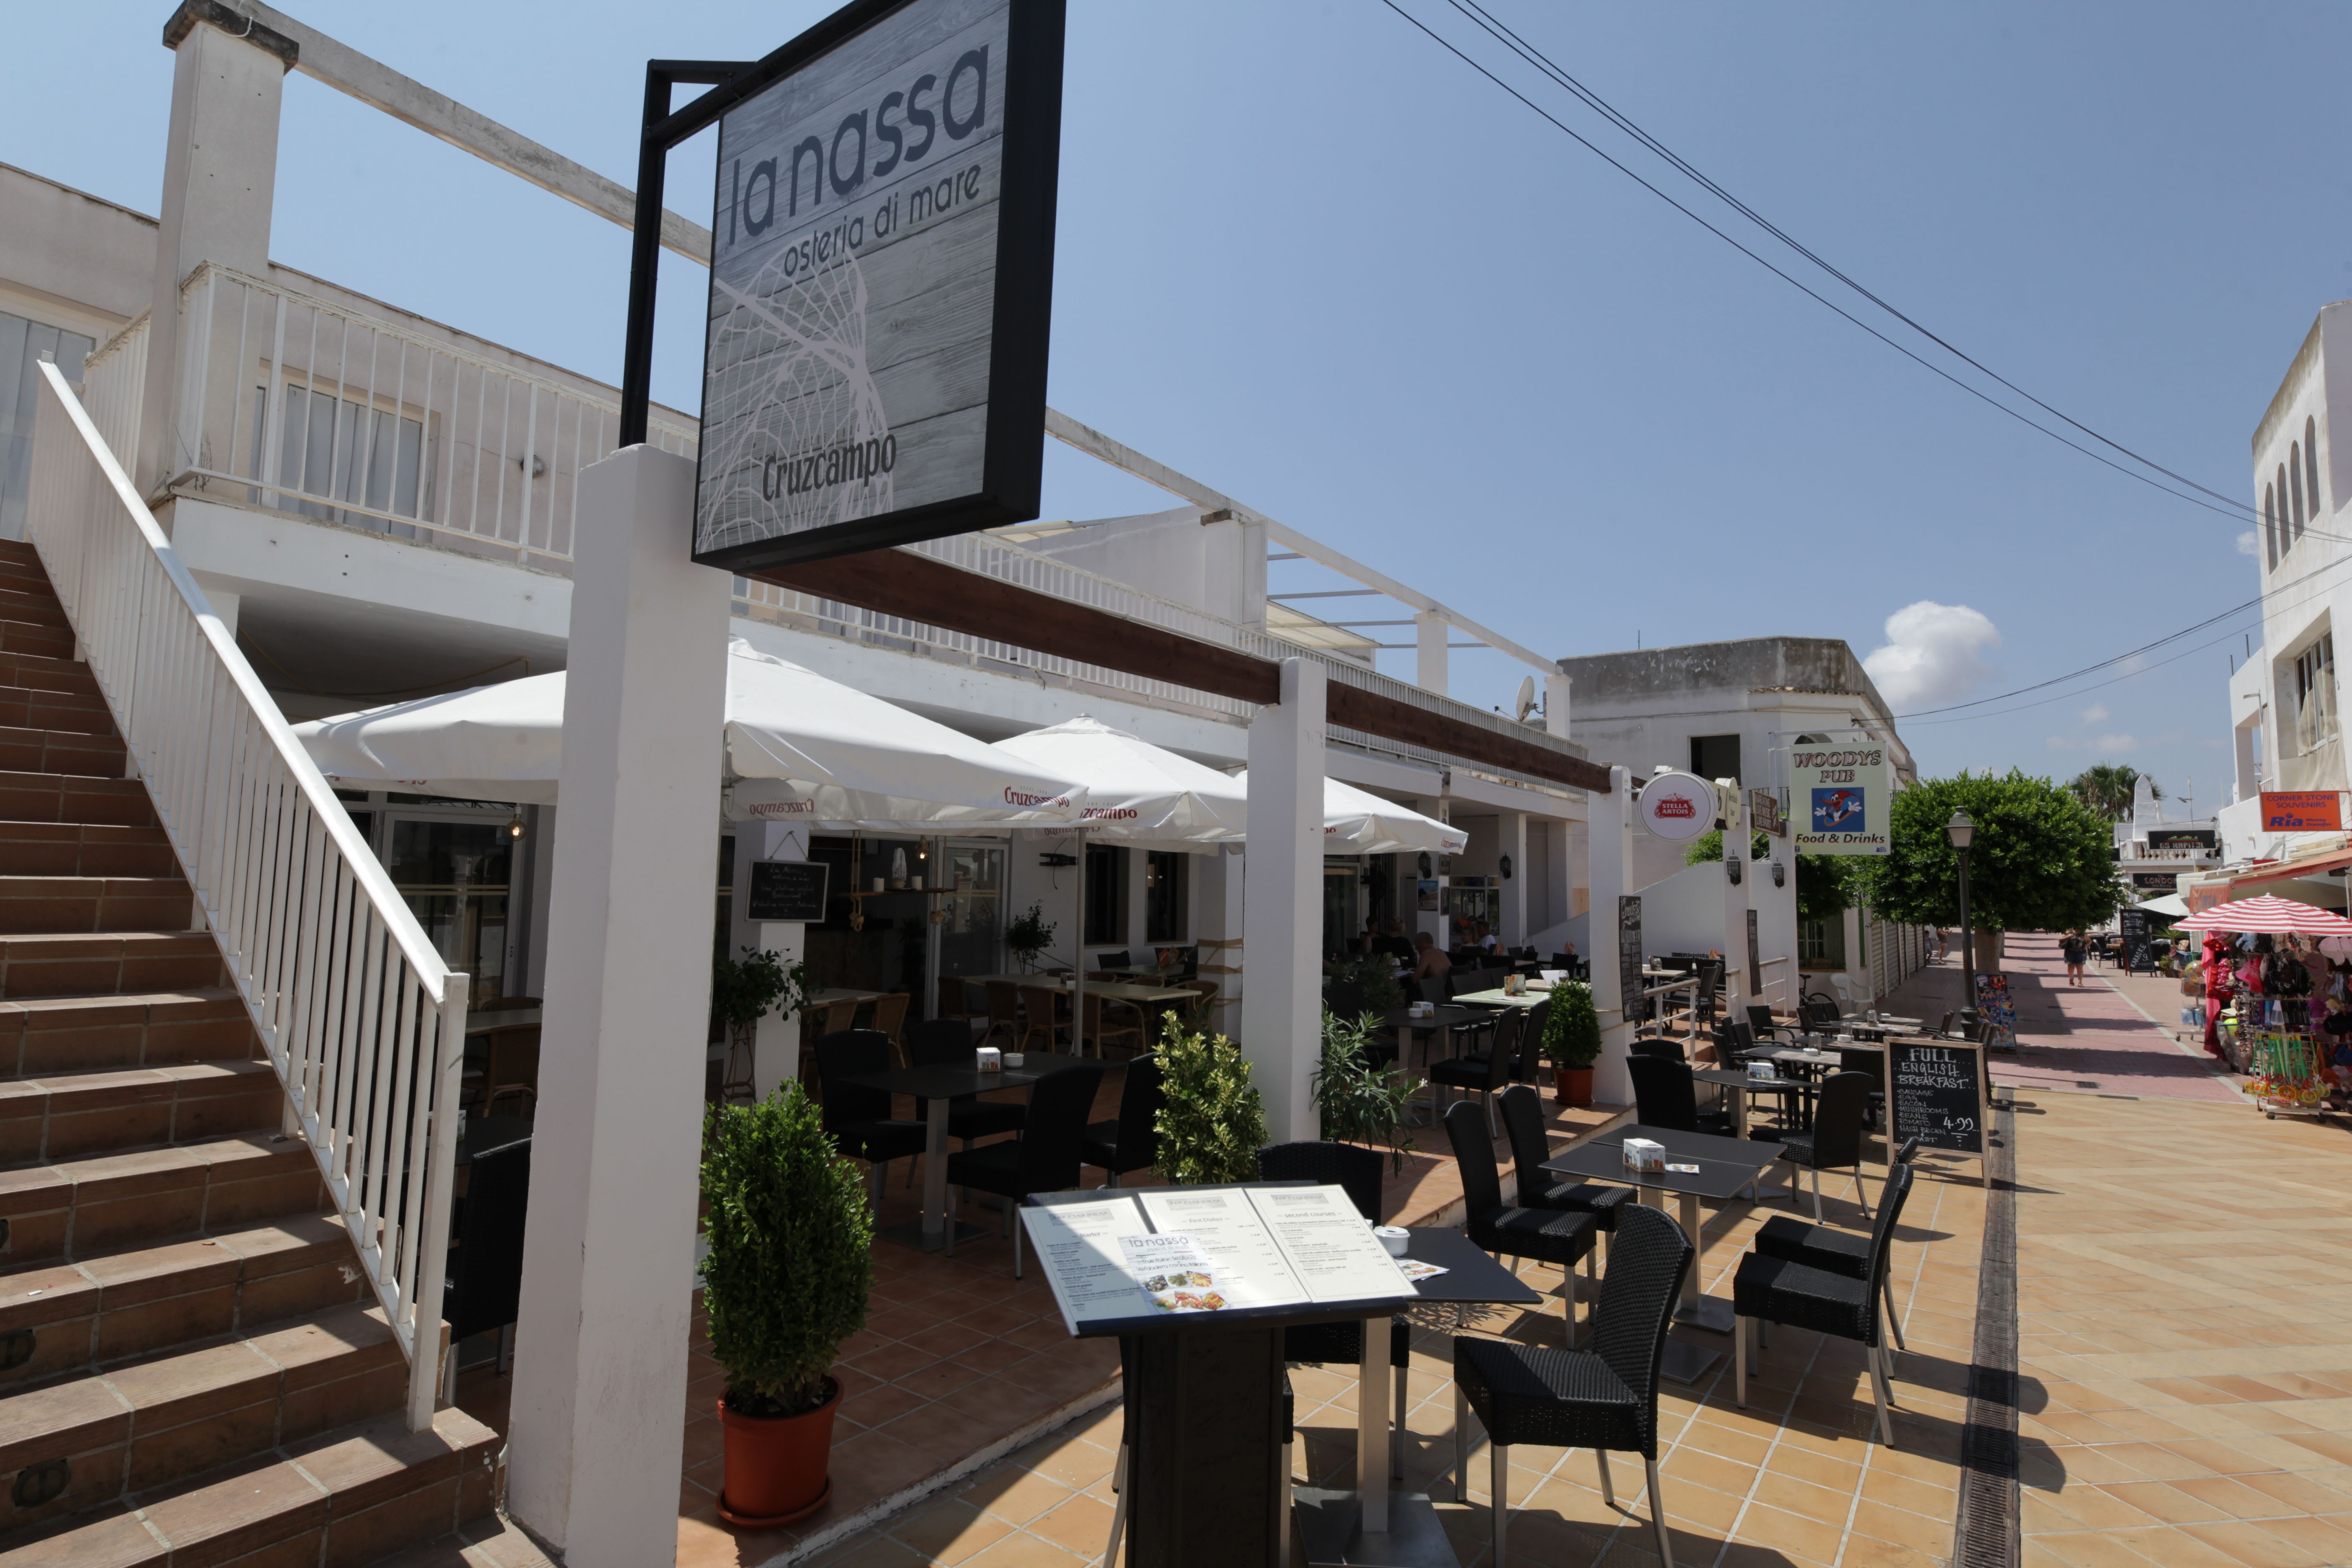 Outdoor terrace Restaurant La Nasa